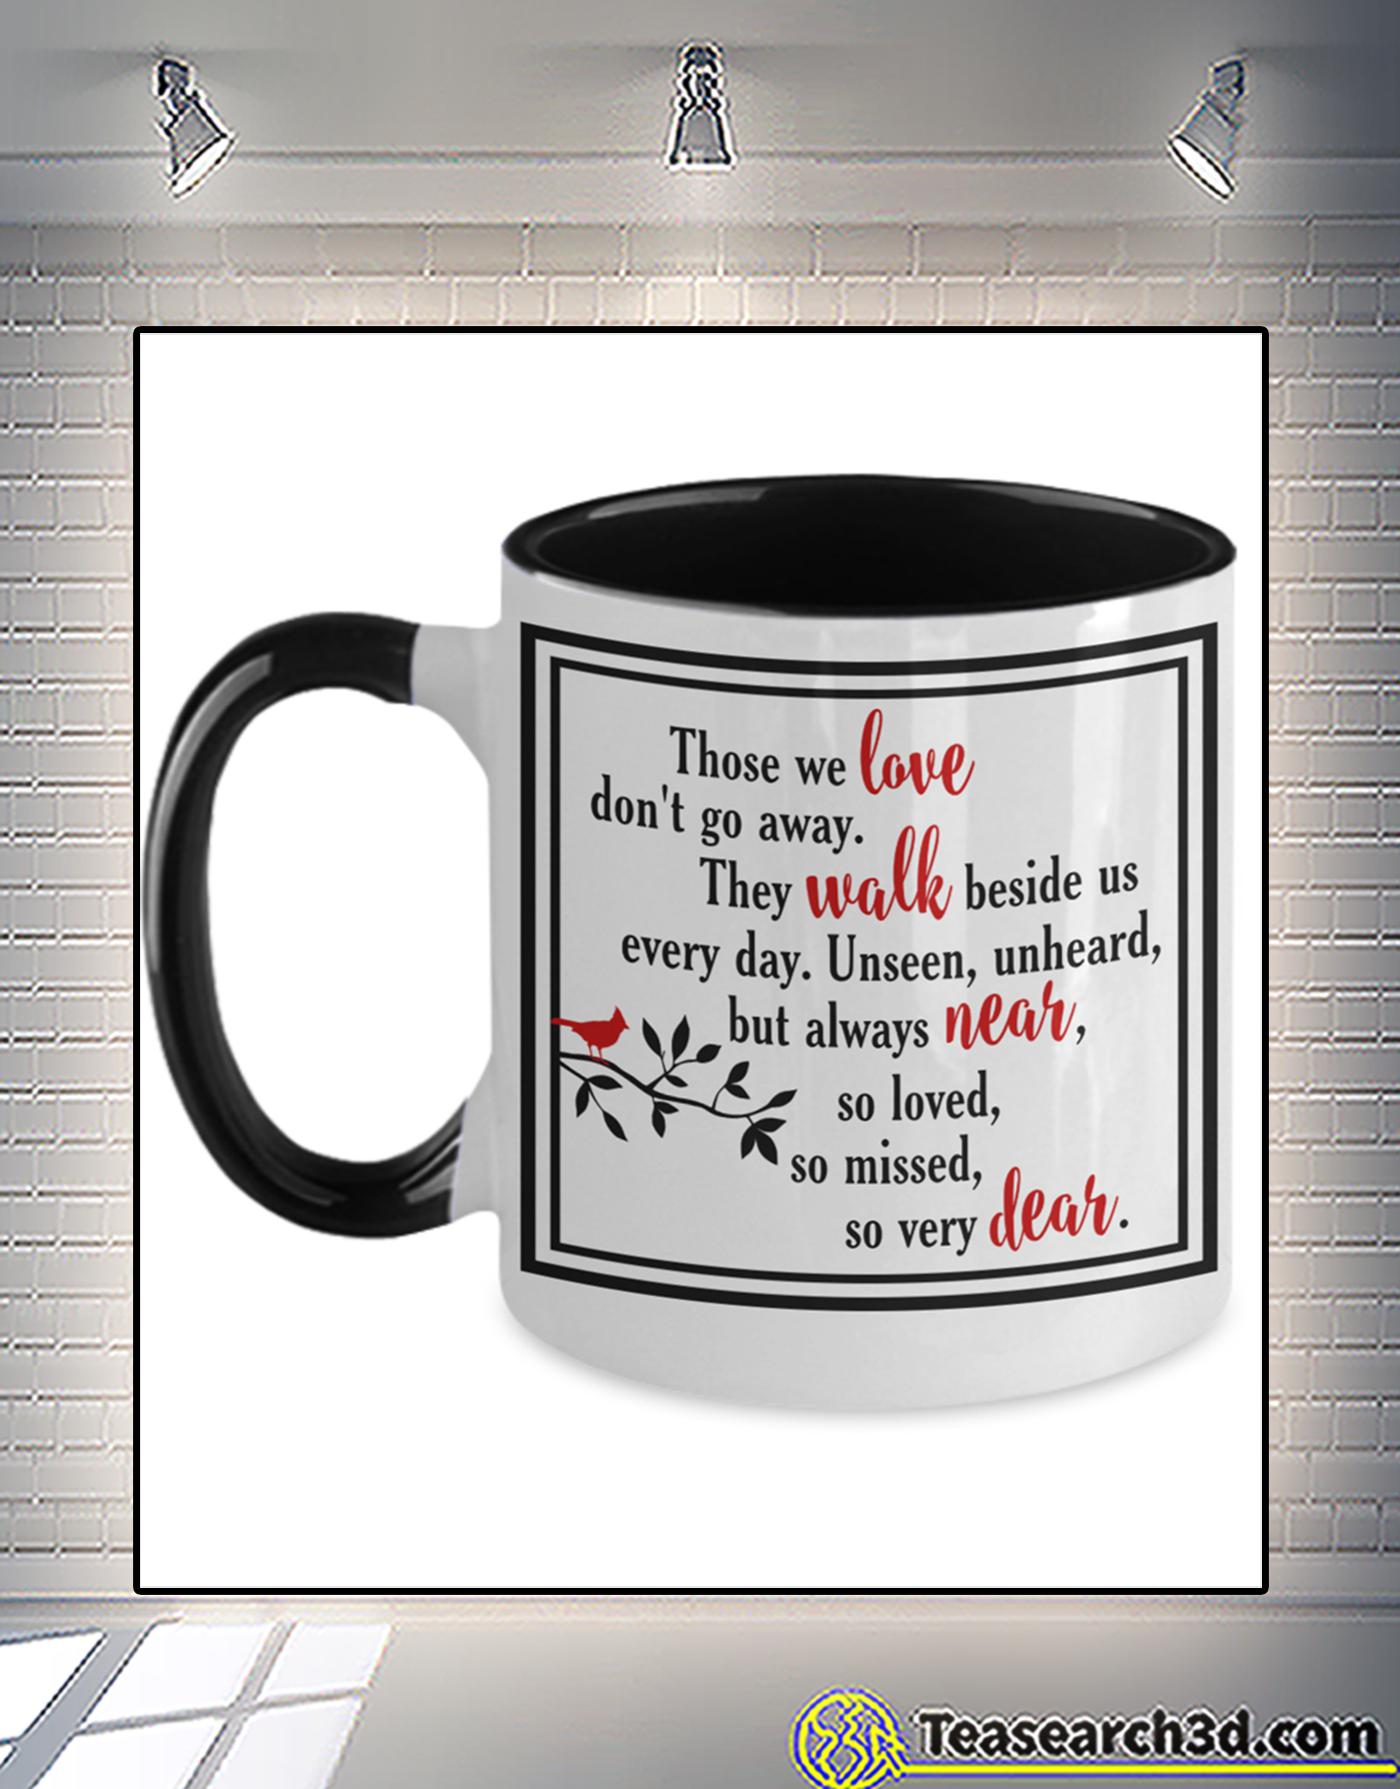 Cardinal those we love don't go away accent mug